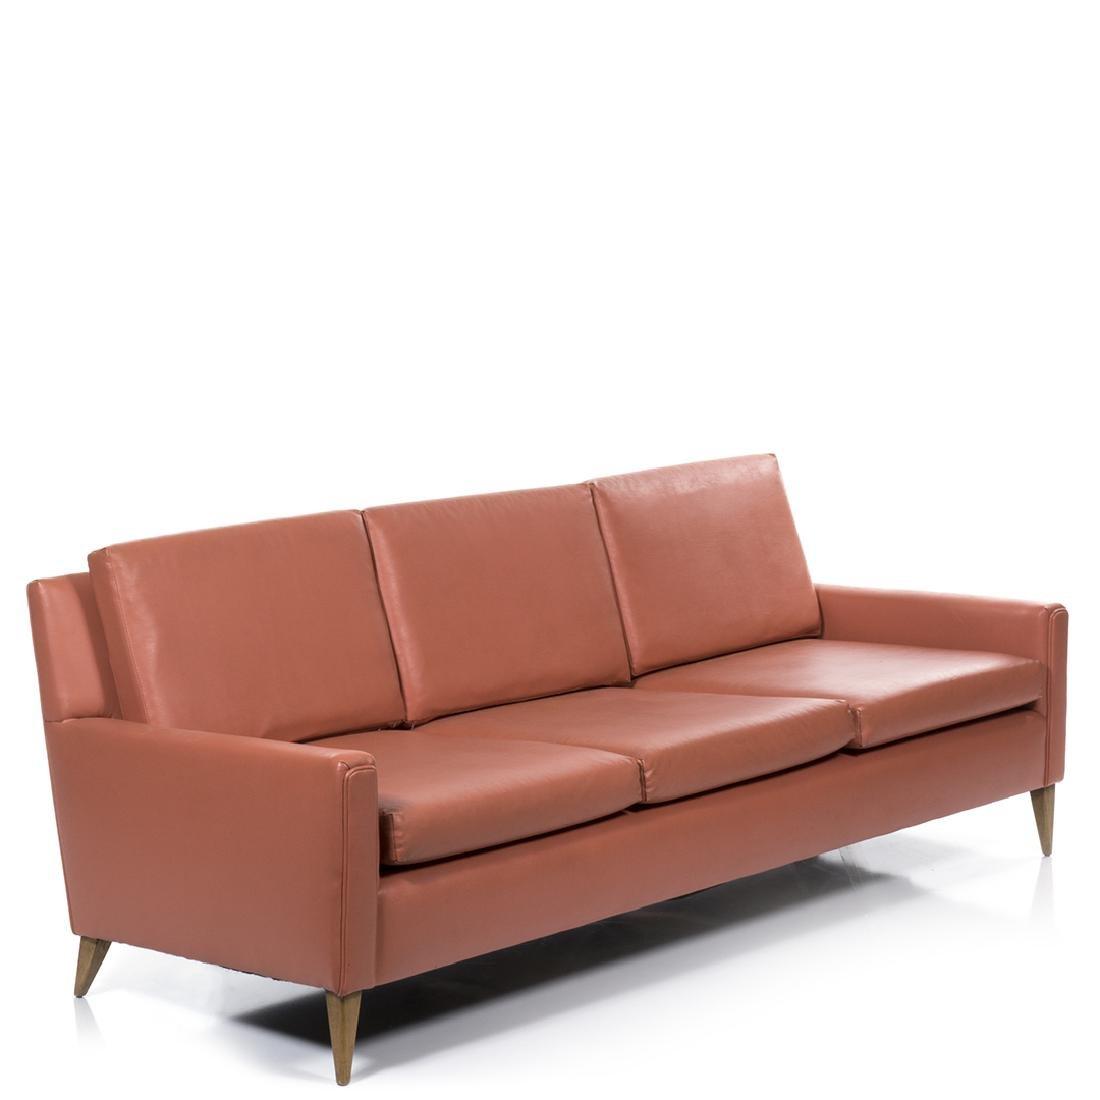 Paul McCobb Sofa - 2